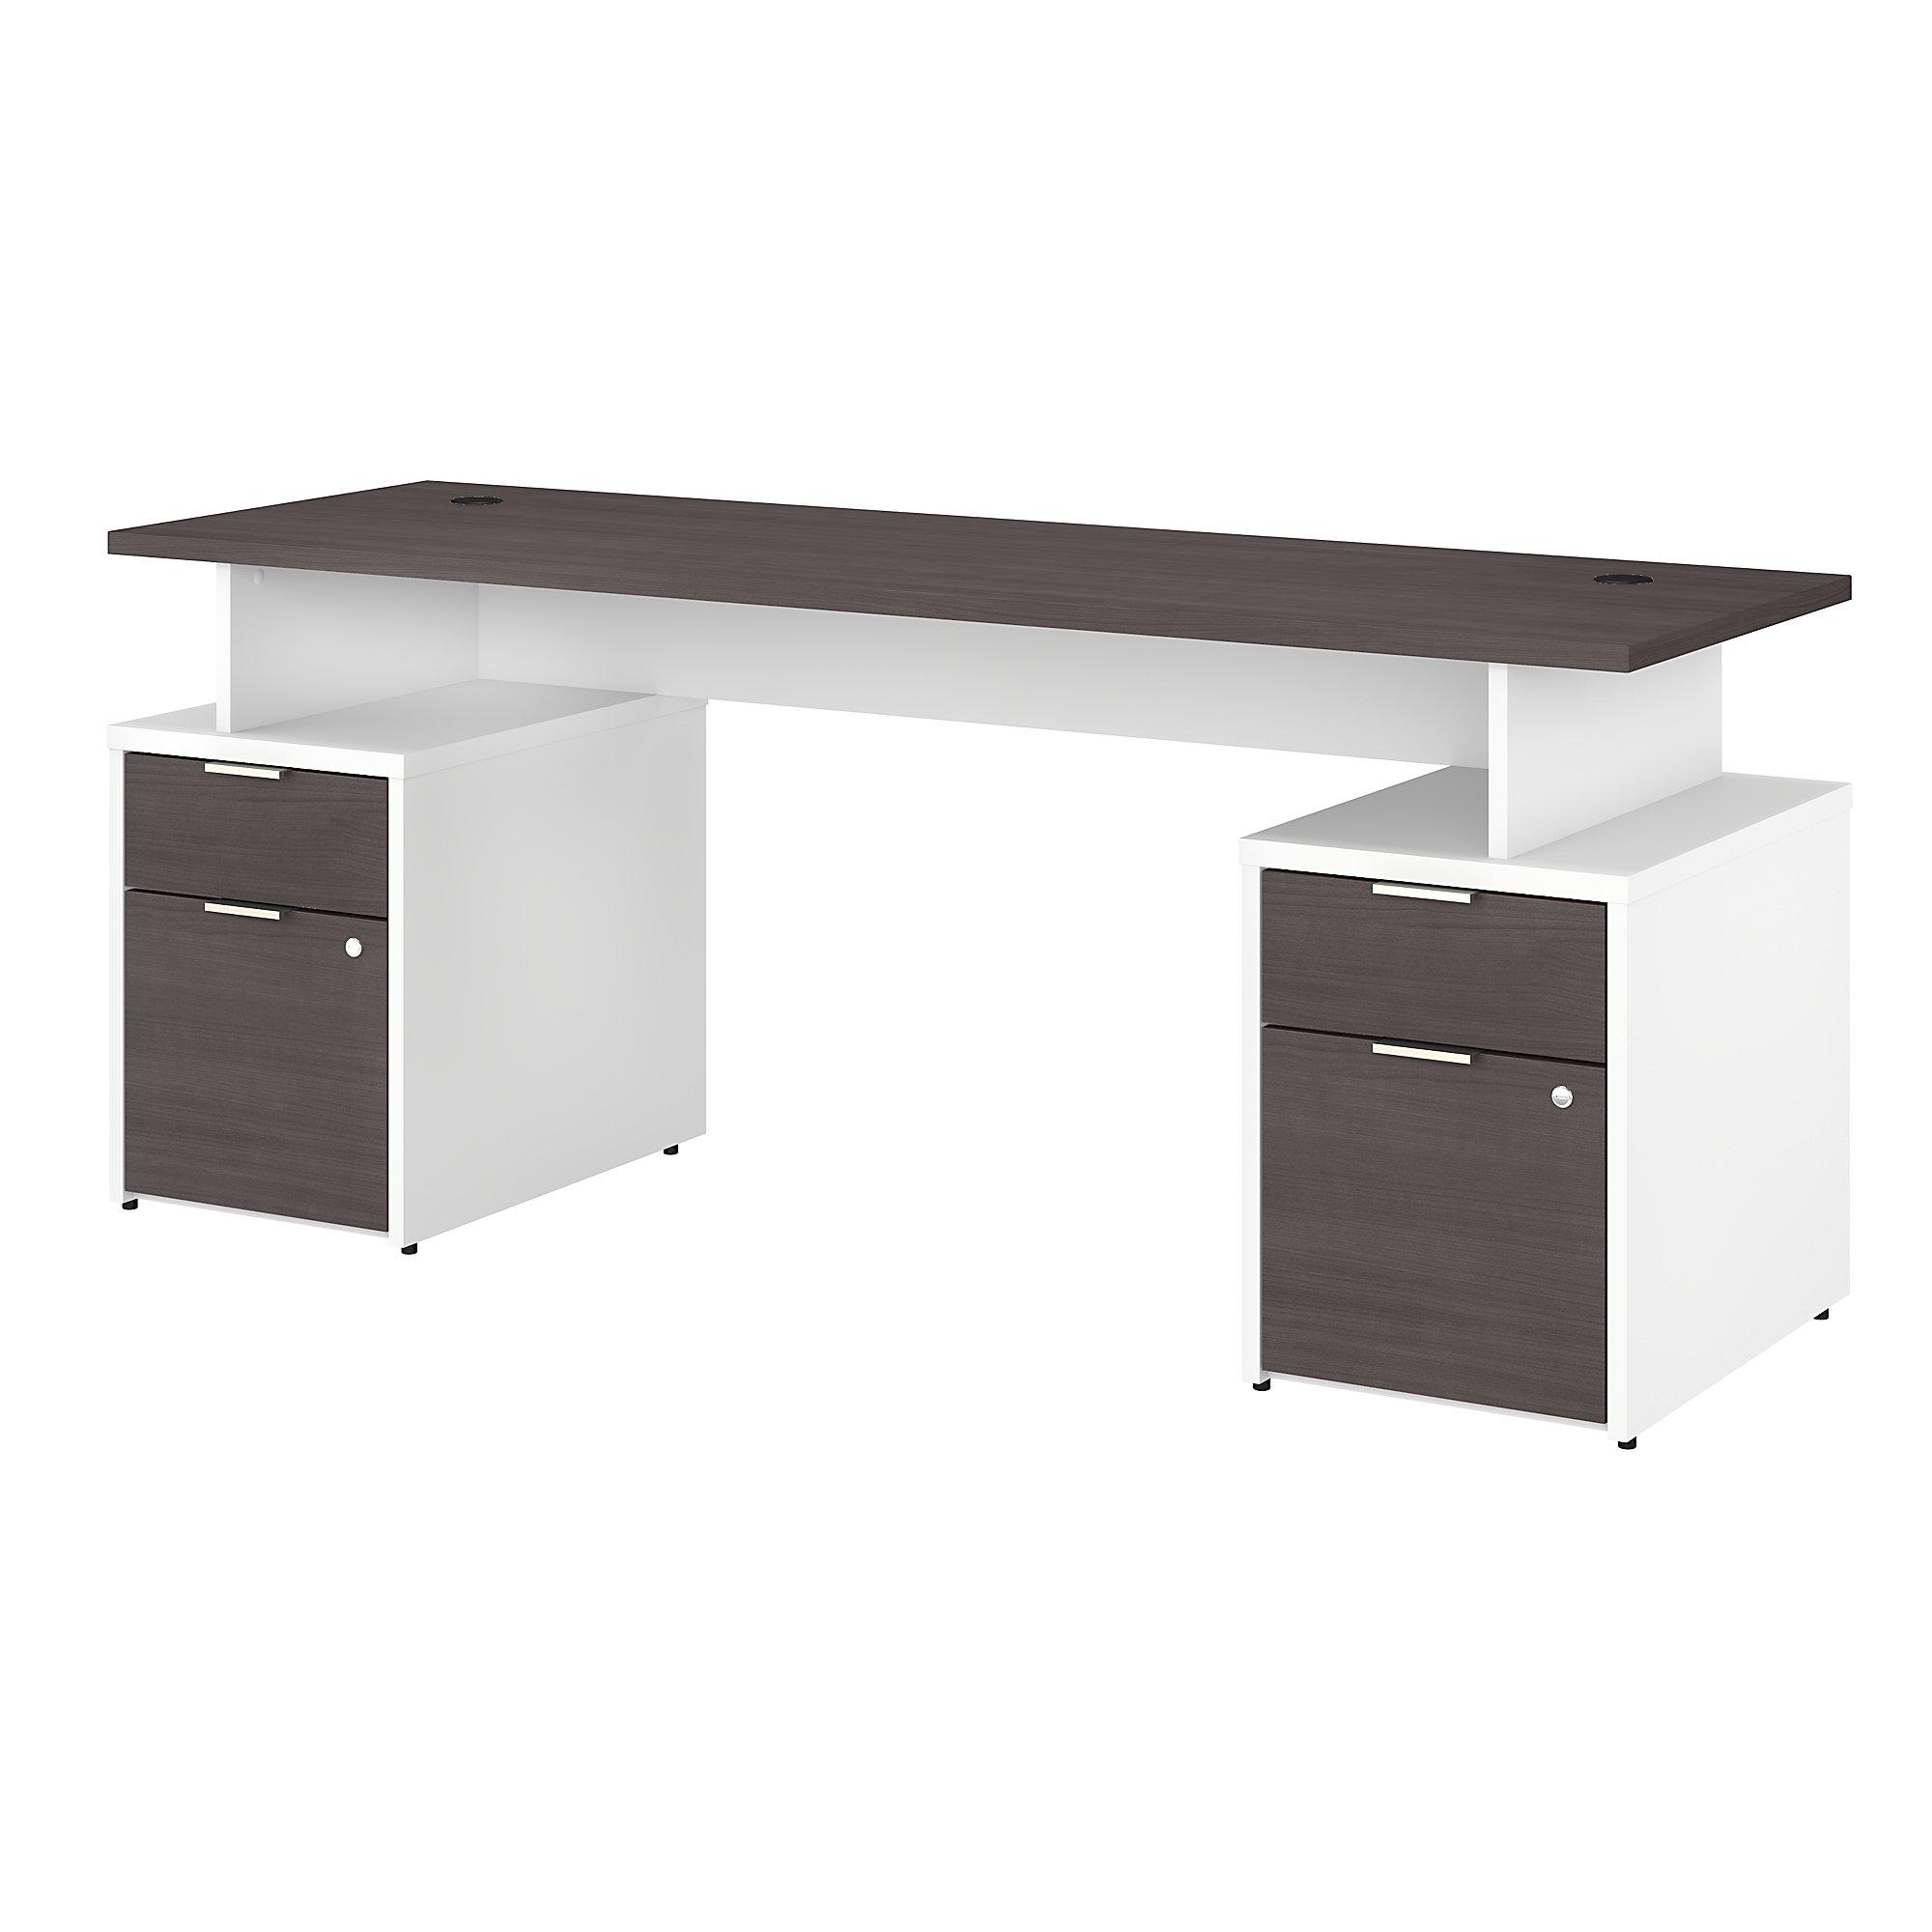 jamestown storm gray and white double pedestal desk